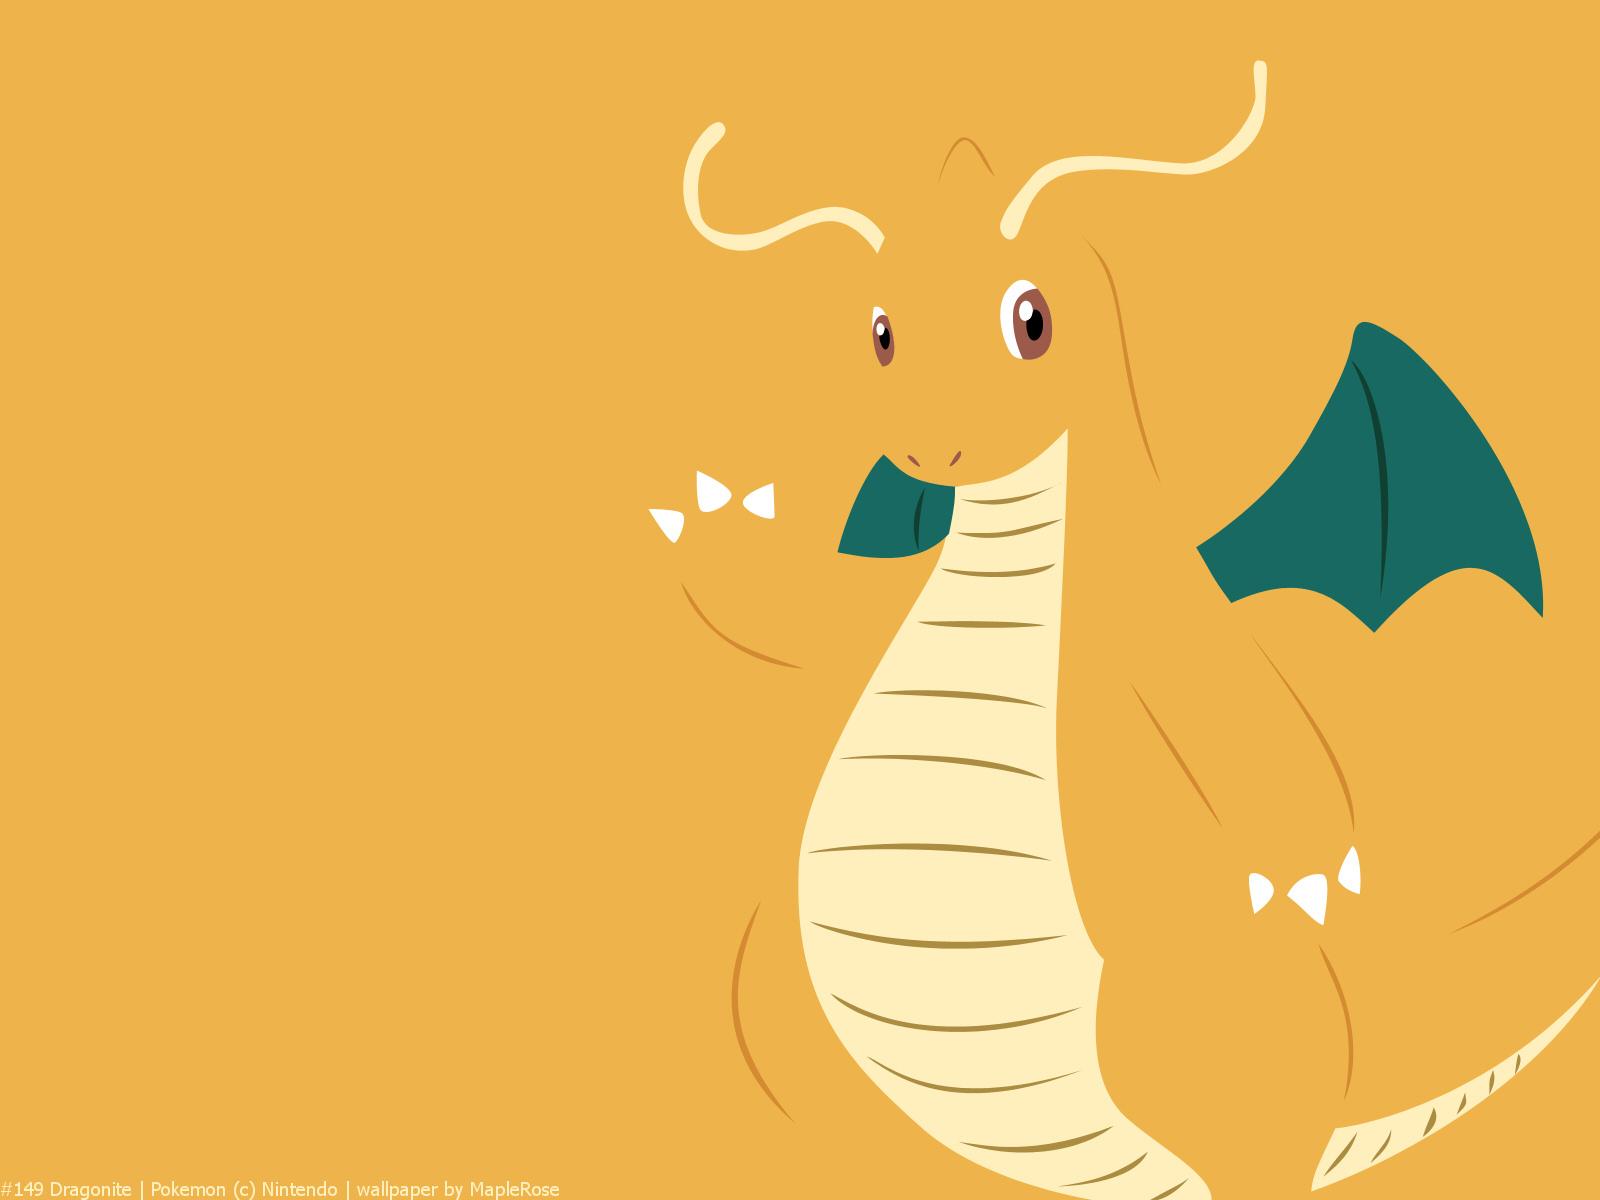 Weakness Policy Dragonite Vp Pokémon Thread 21225108 Ou Stumbling